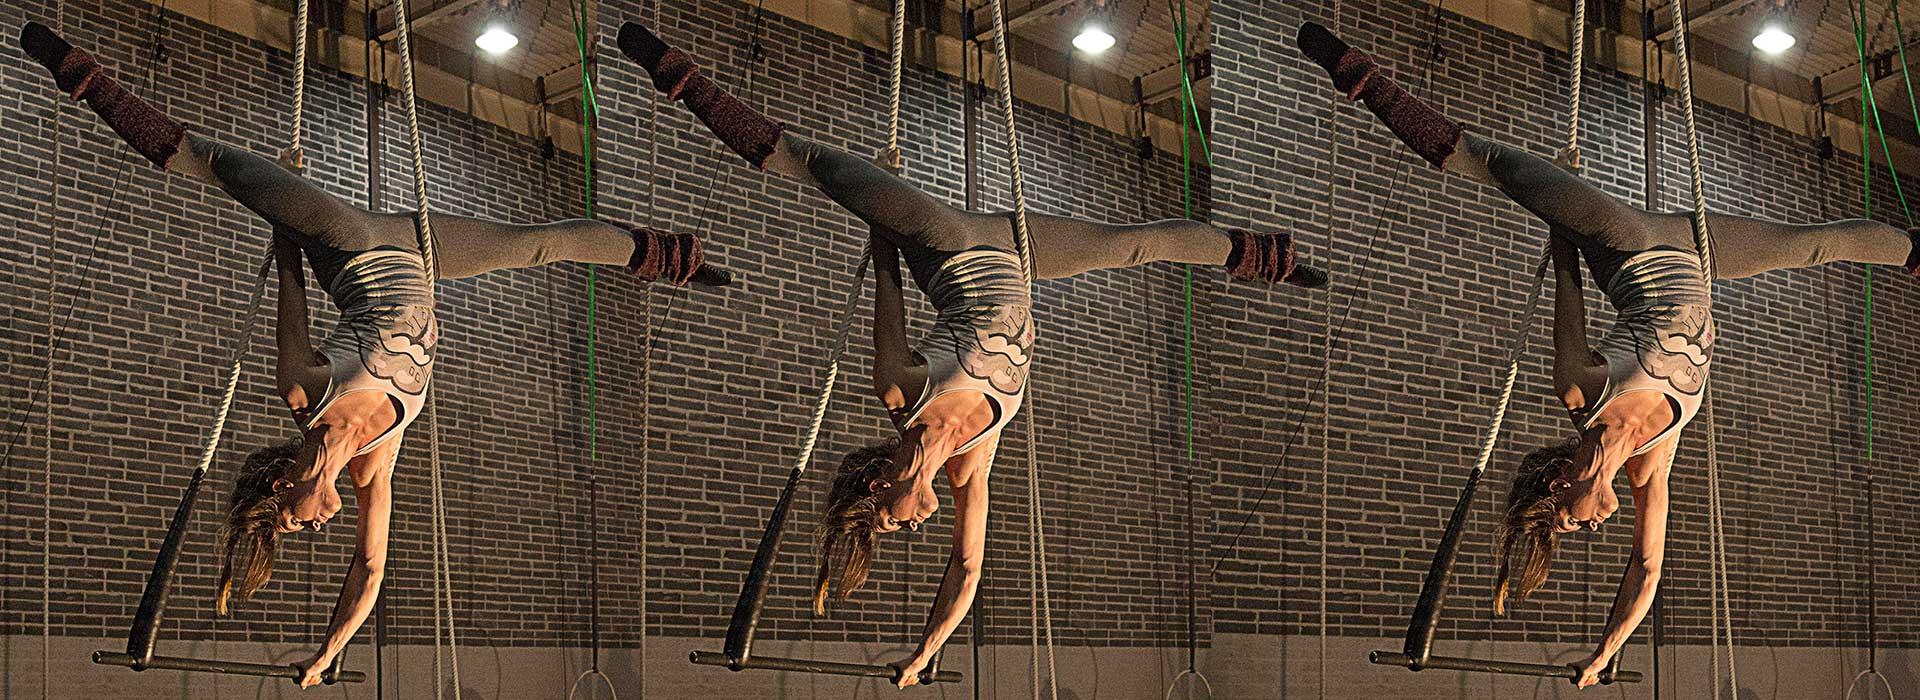 Irish Aerial Creation Centre Professional Artist on Rope